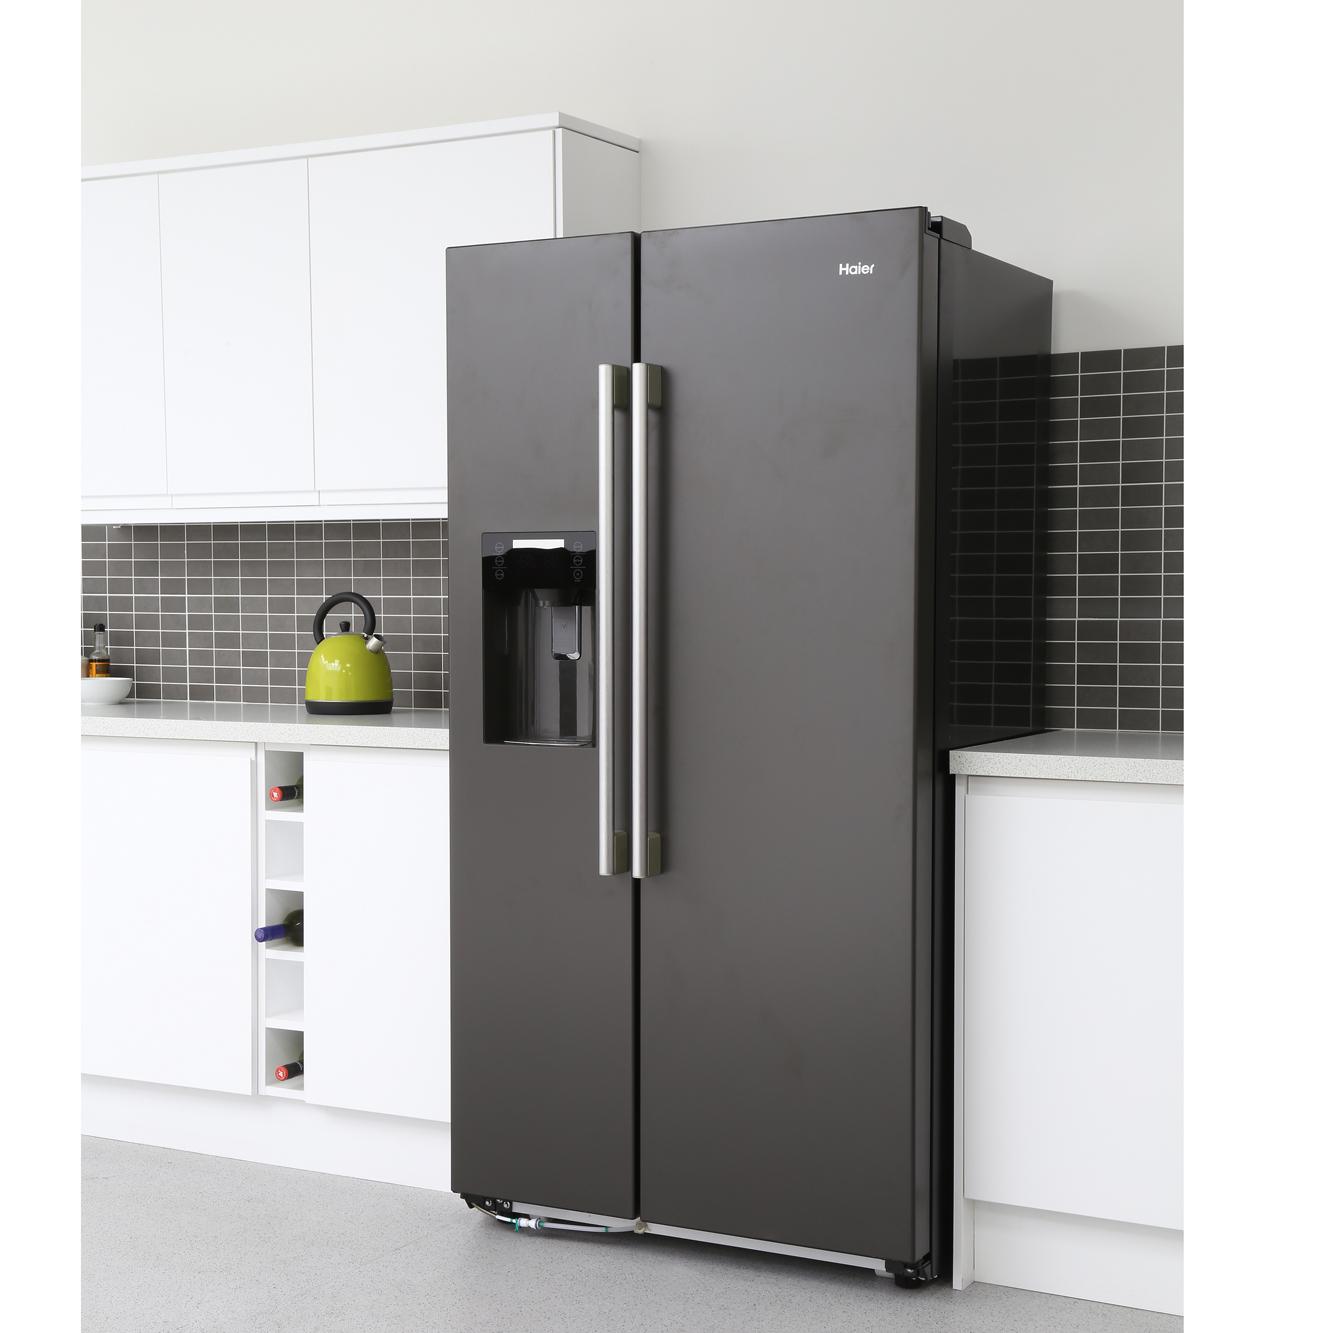 buy haier hrf 628in6 american fridge freezer anthracite marks electrical. Black Bedroom Furniture Sets. Home Design Ideas